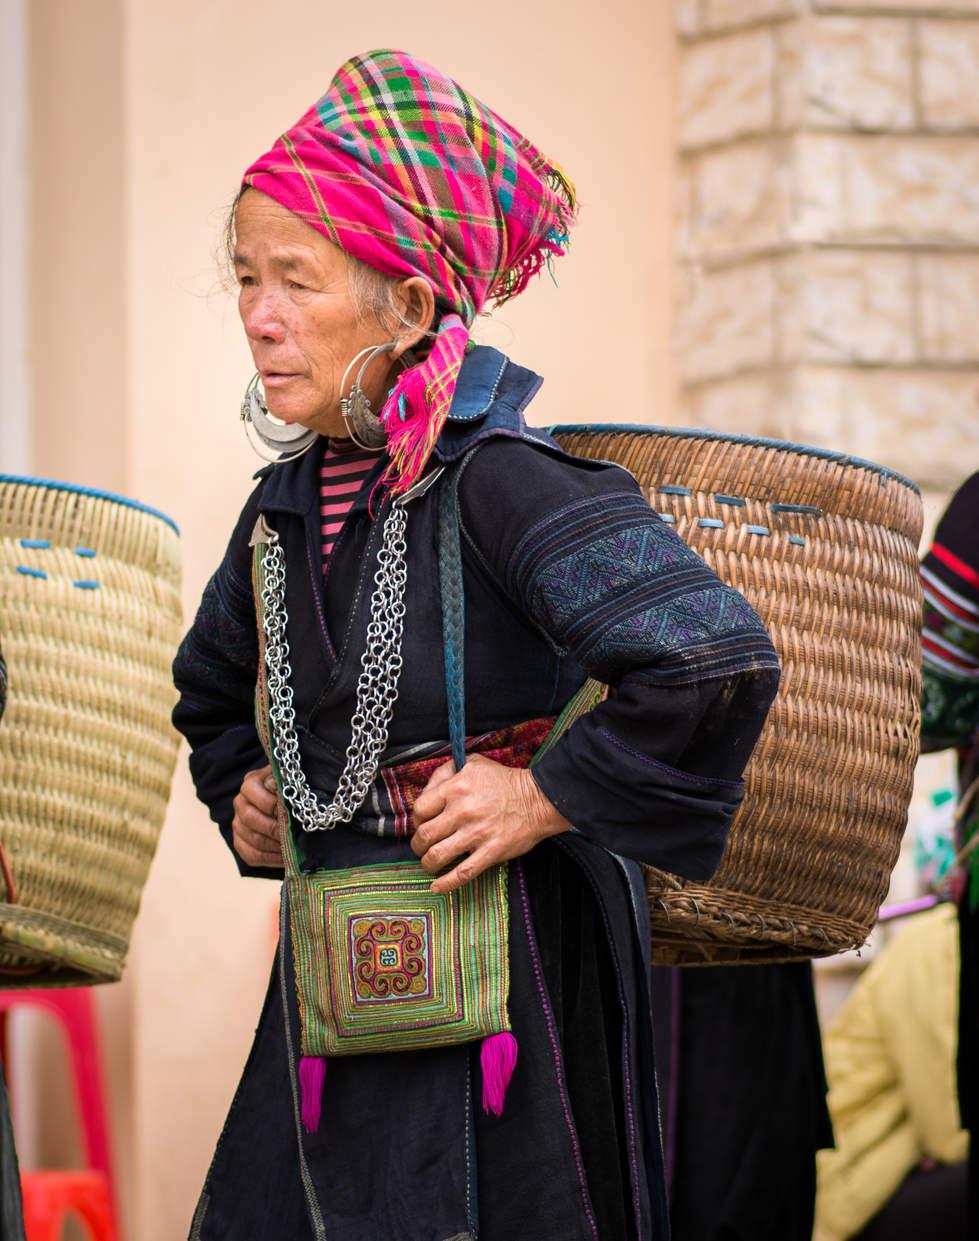 Kobieta w stroju Hmong na targu, Sapa